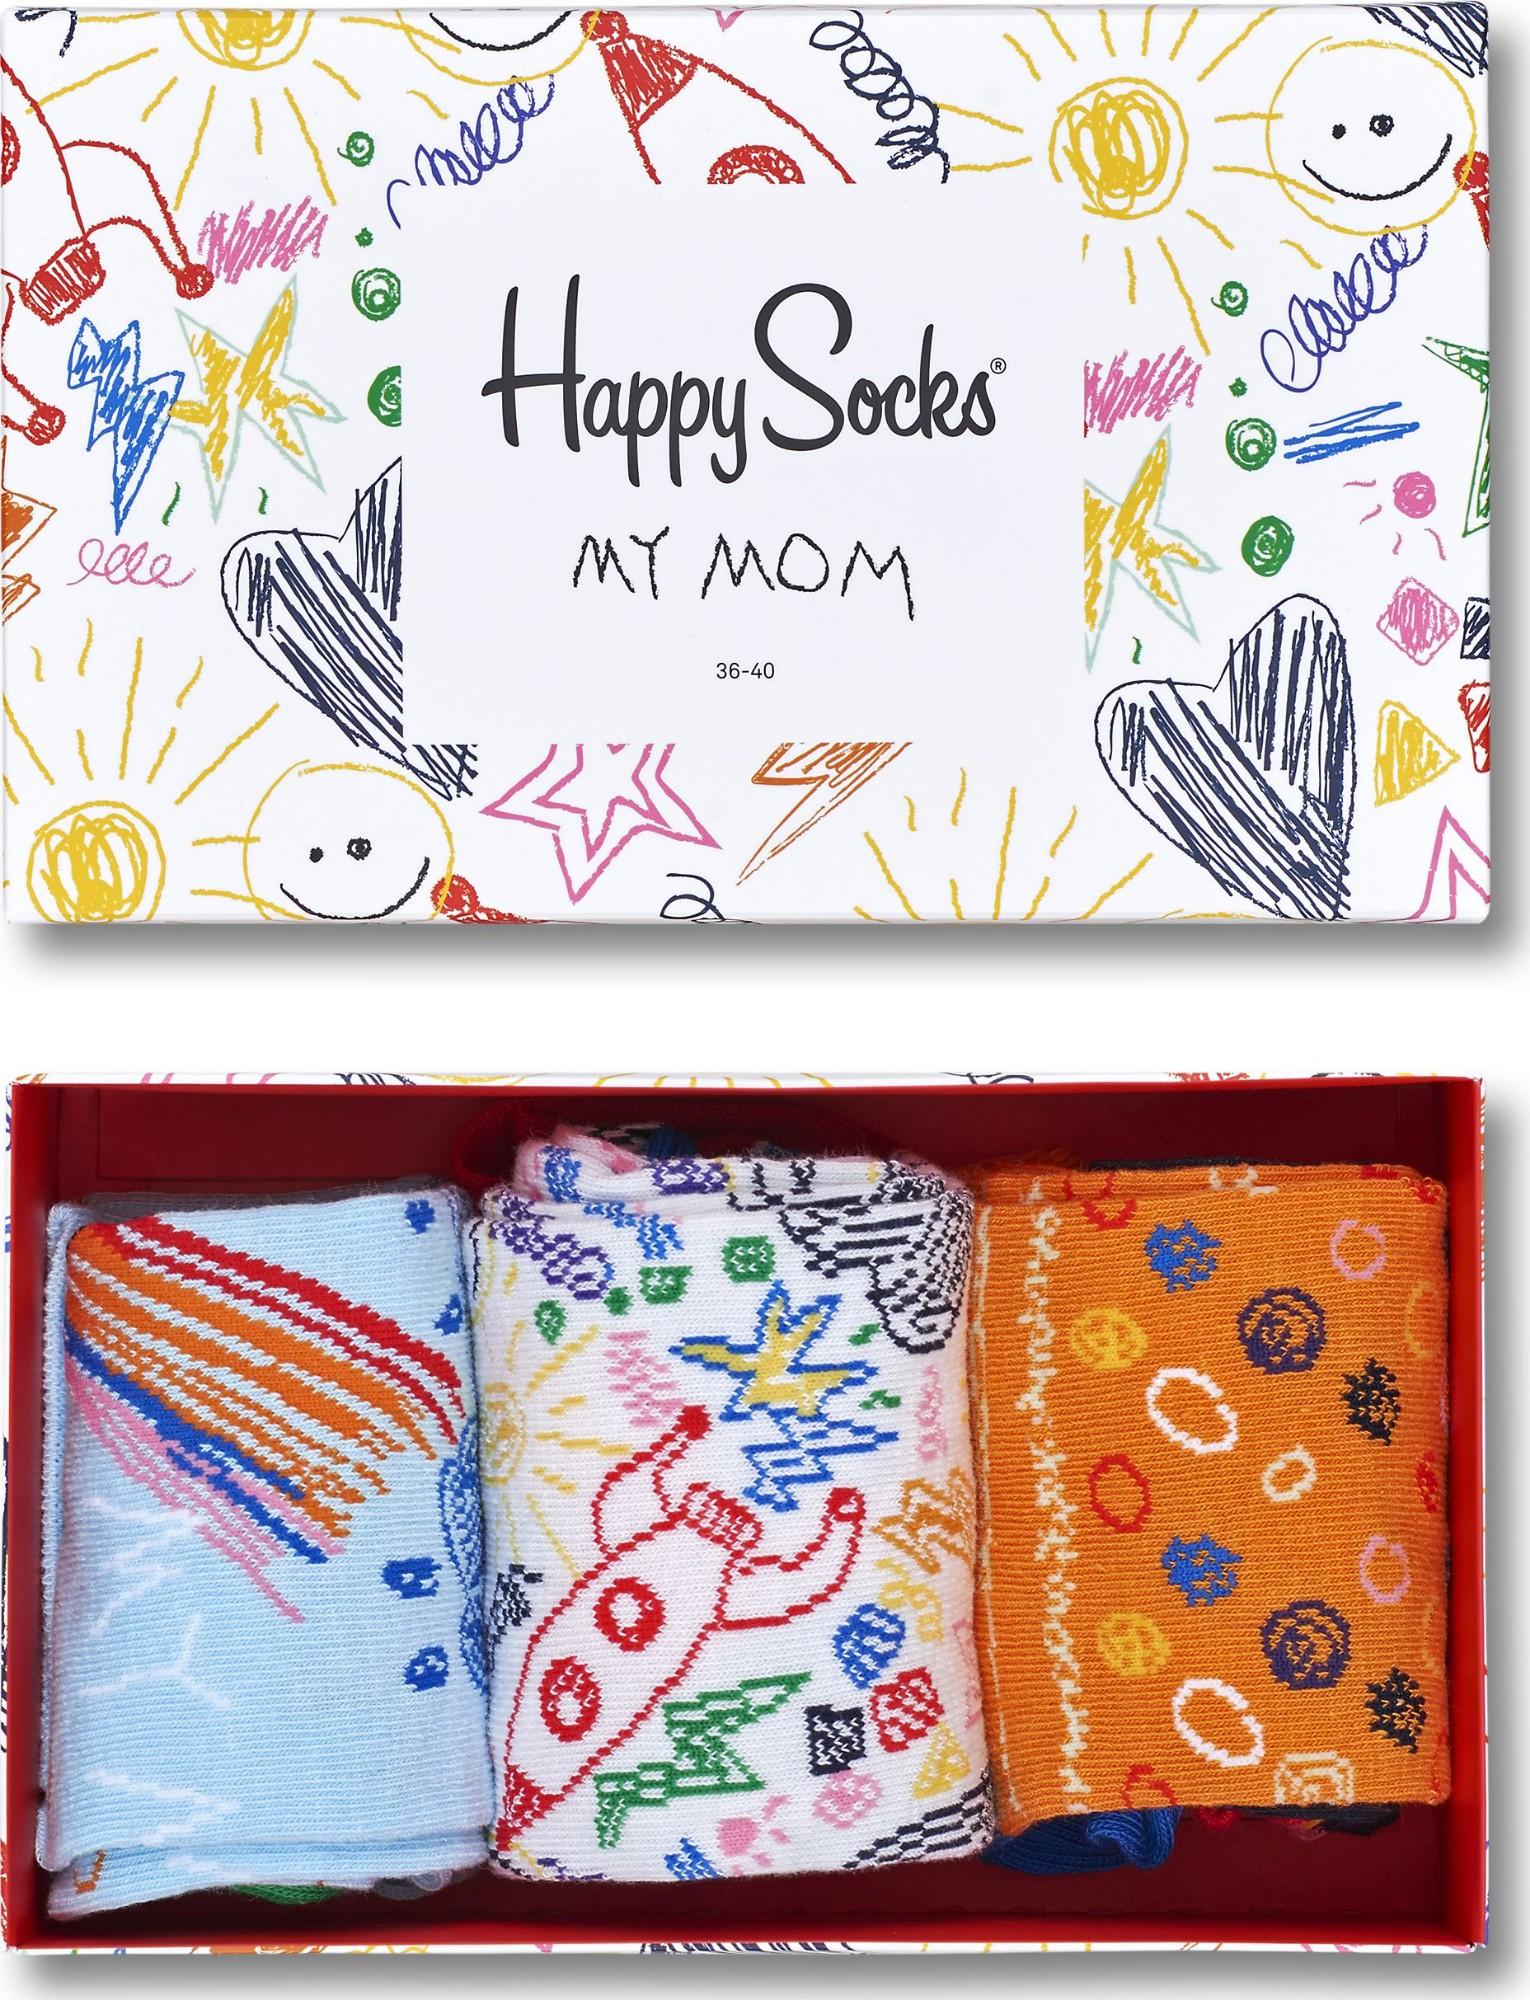 Happy Socks Mother's Day Gift Box Blue/White/Orange 36-40